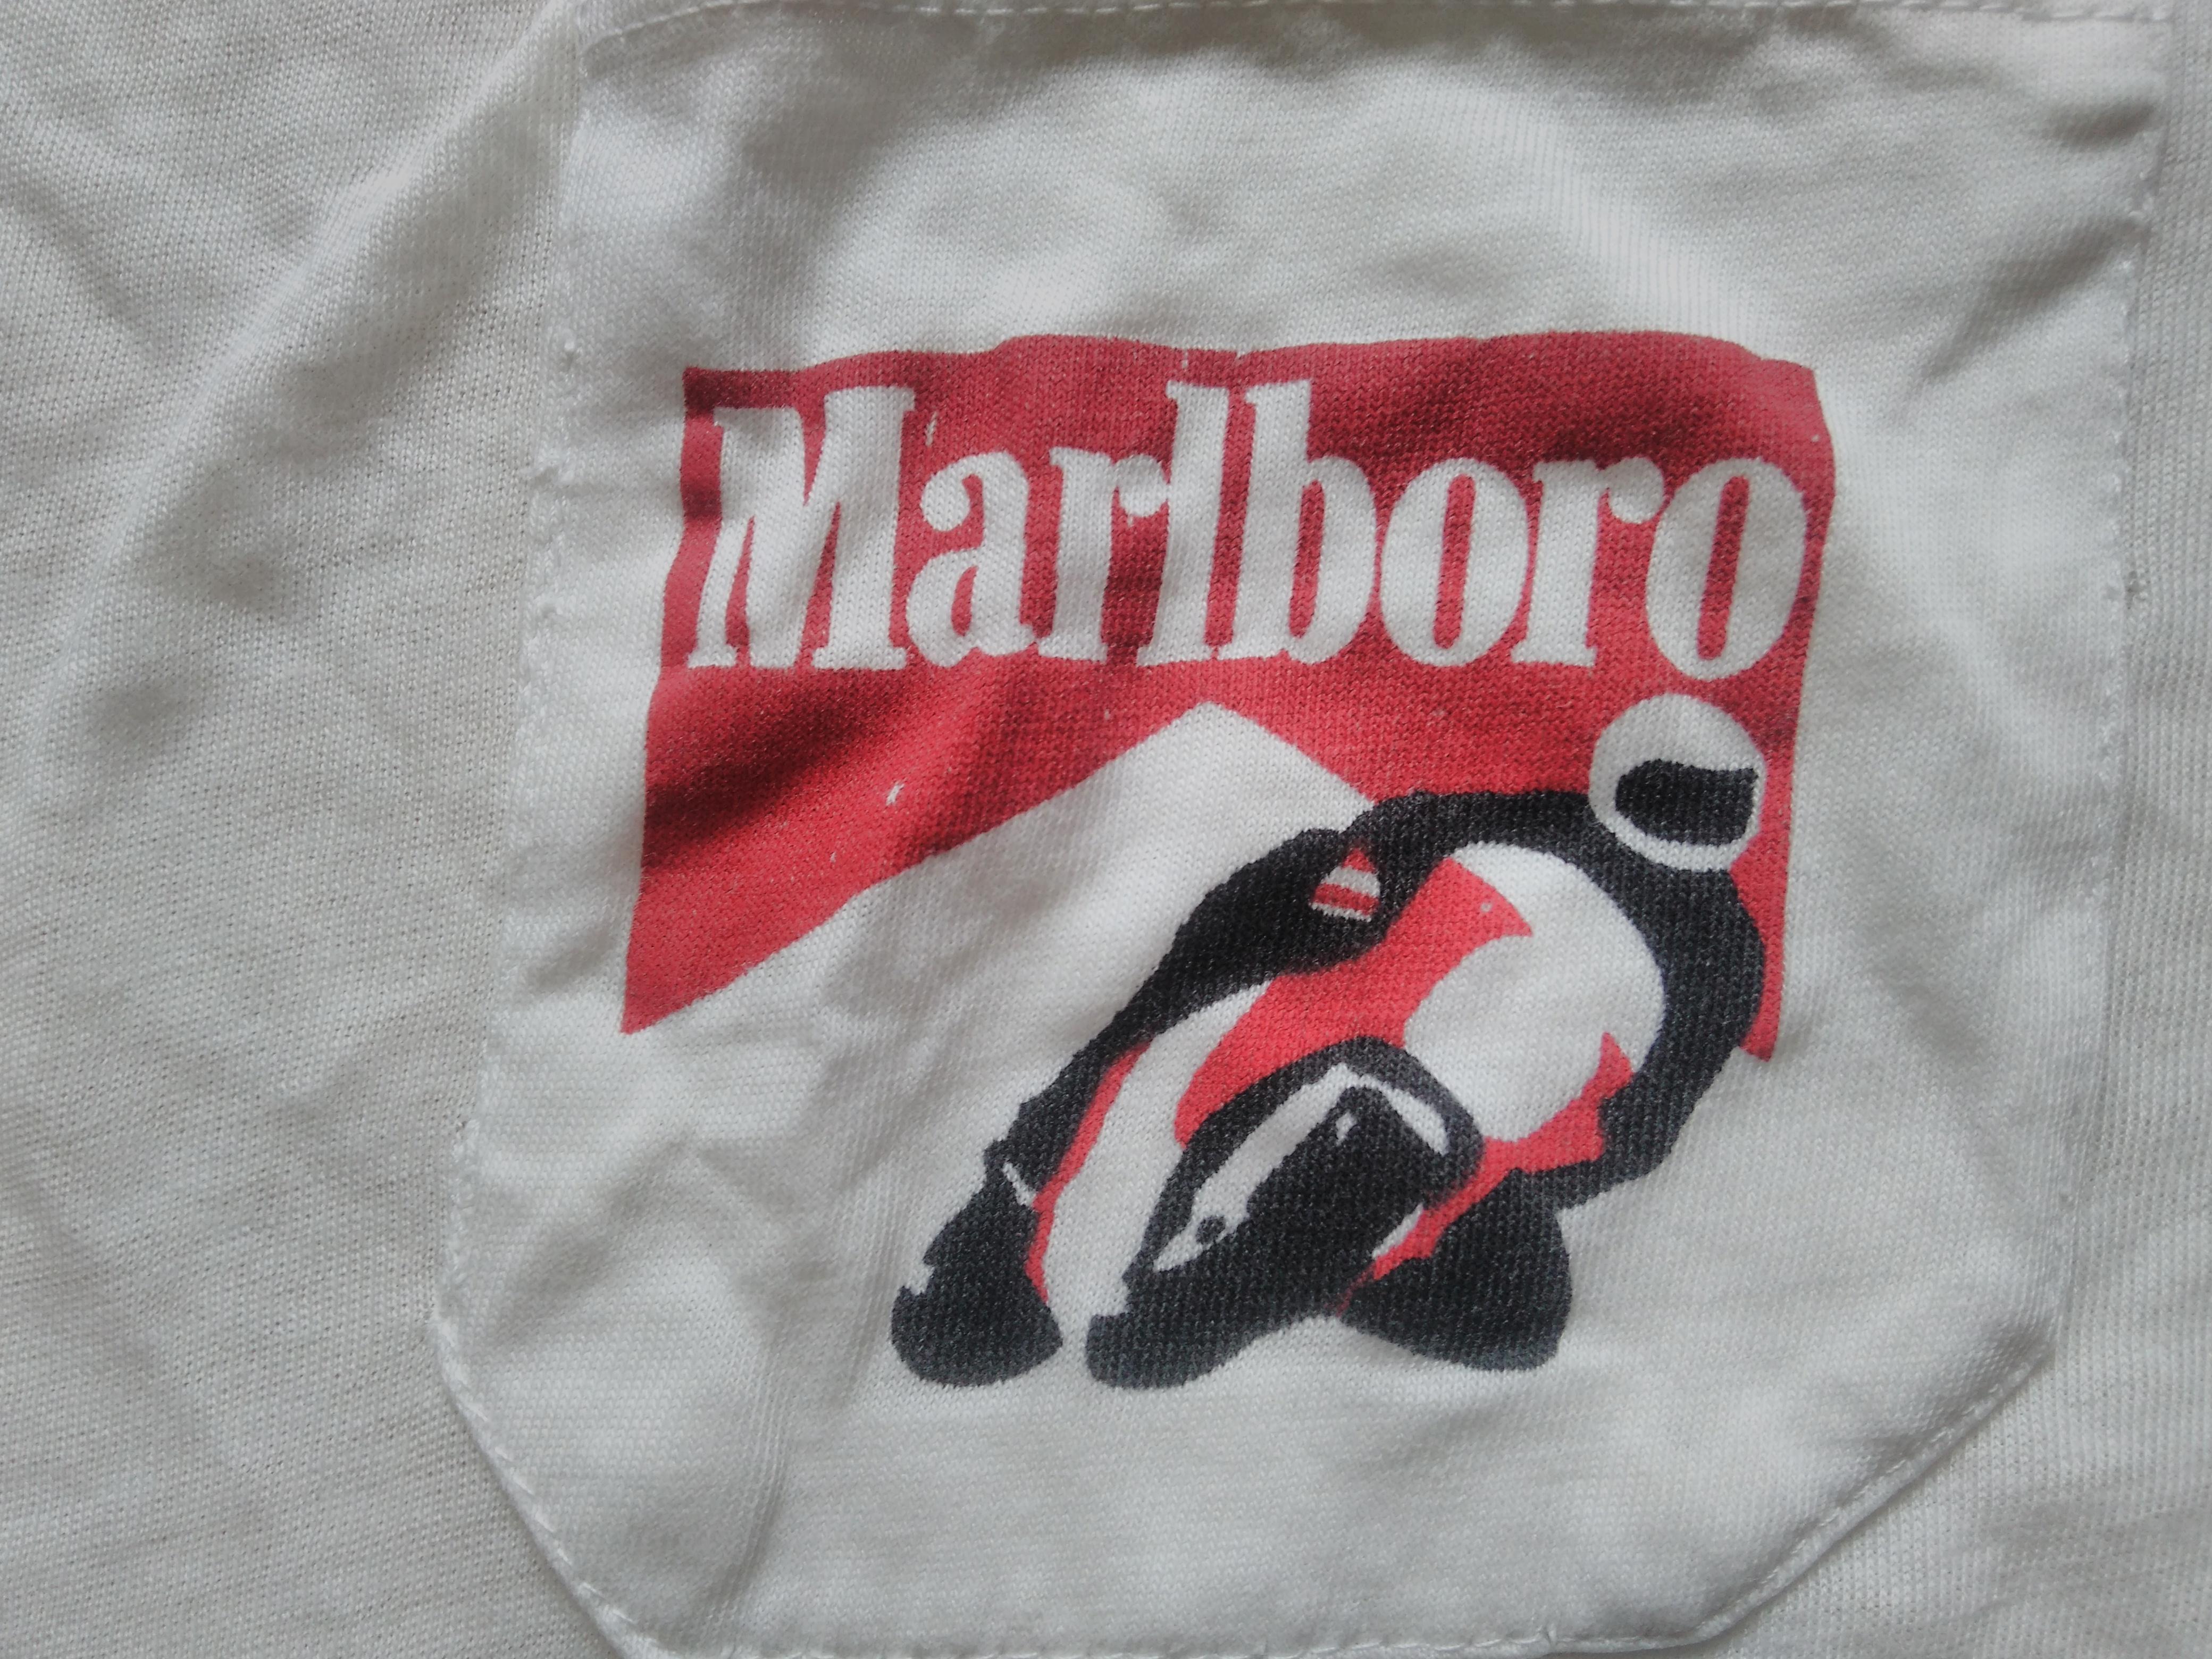 6ae806a96 Vintage 70s Rare Marlboro Pocket T-shirt, Vintage Marlboro, Marlboro ...